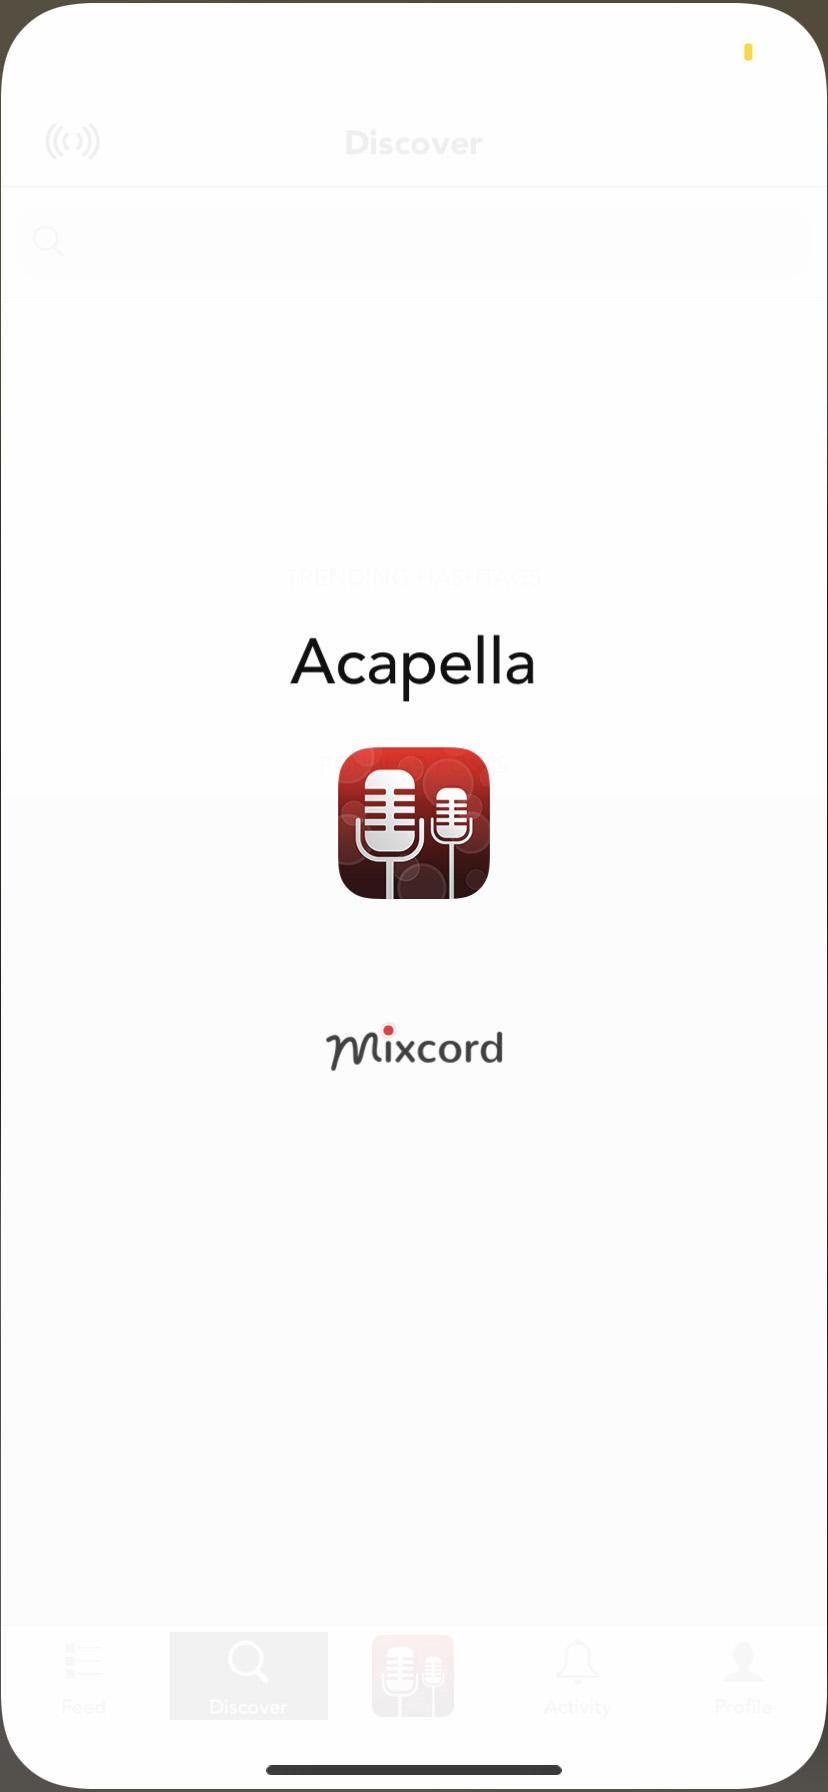 Acapella app welcome screen